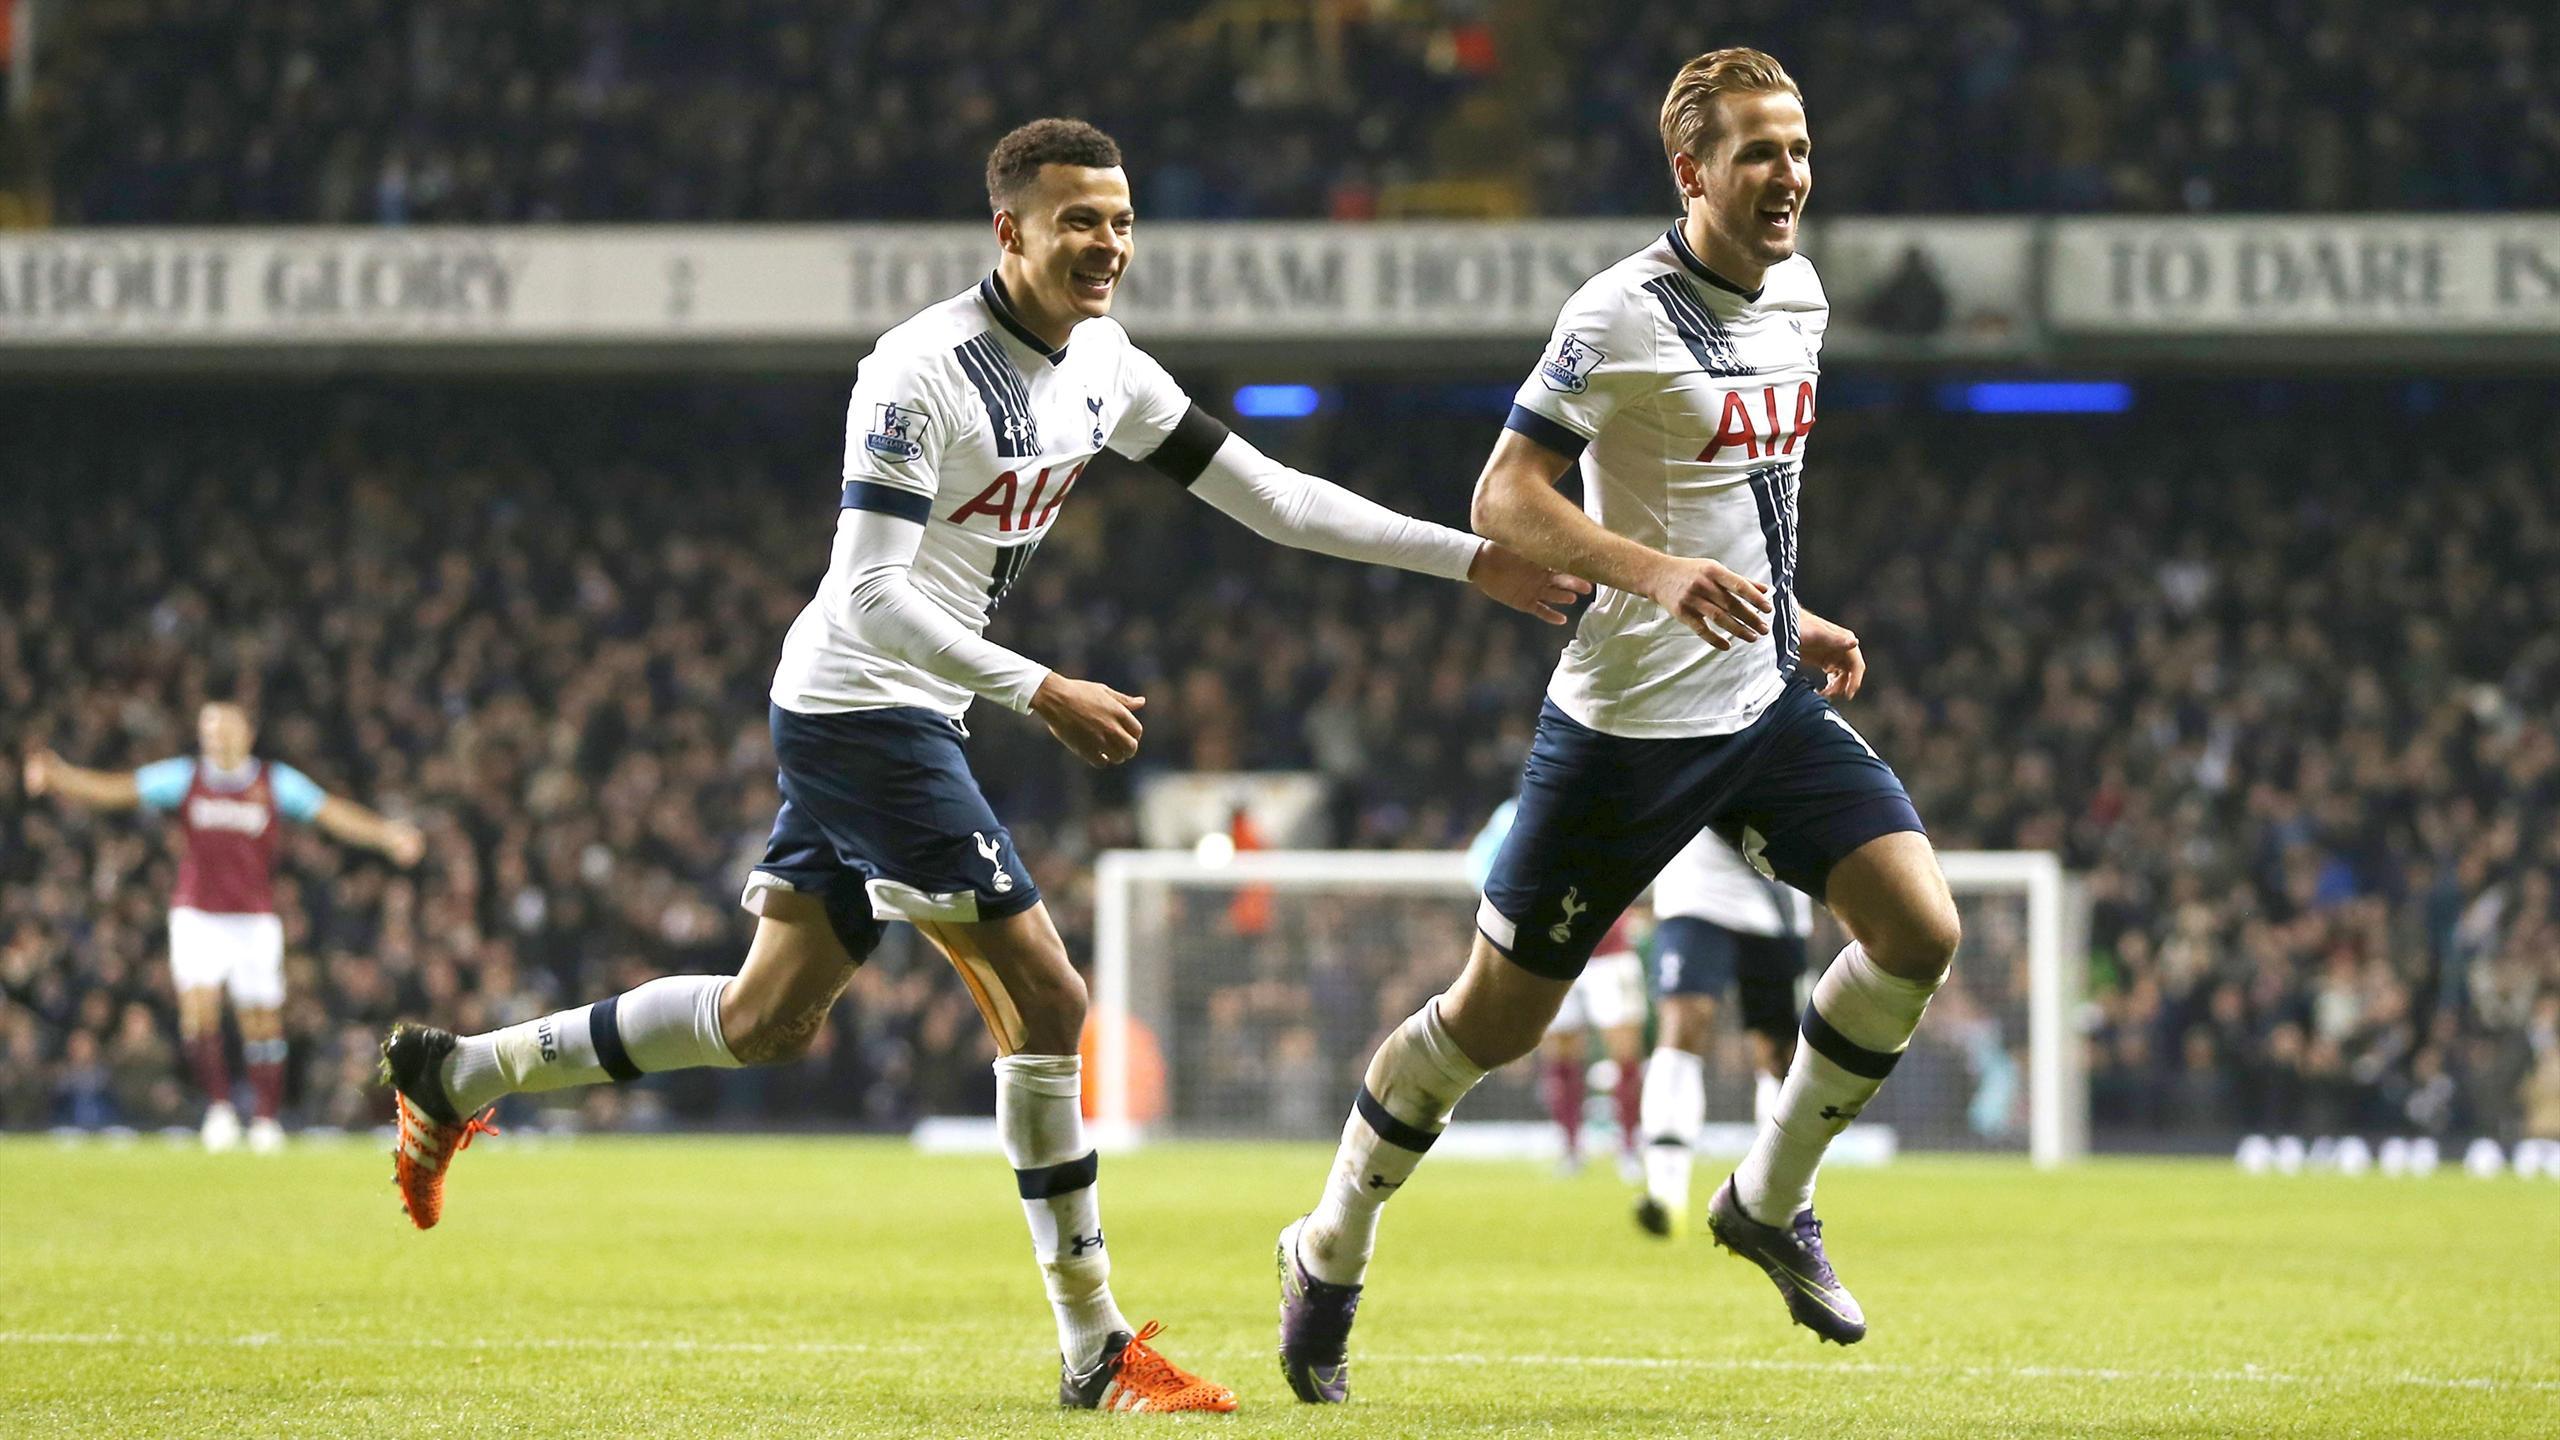 Dele Alli Harry Kane Headline Pfa Young Player Of The Year Shortlist Eurosport